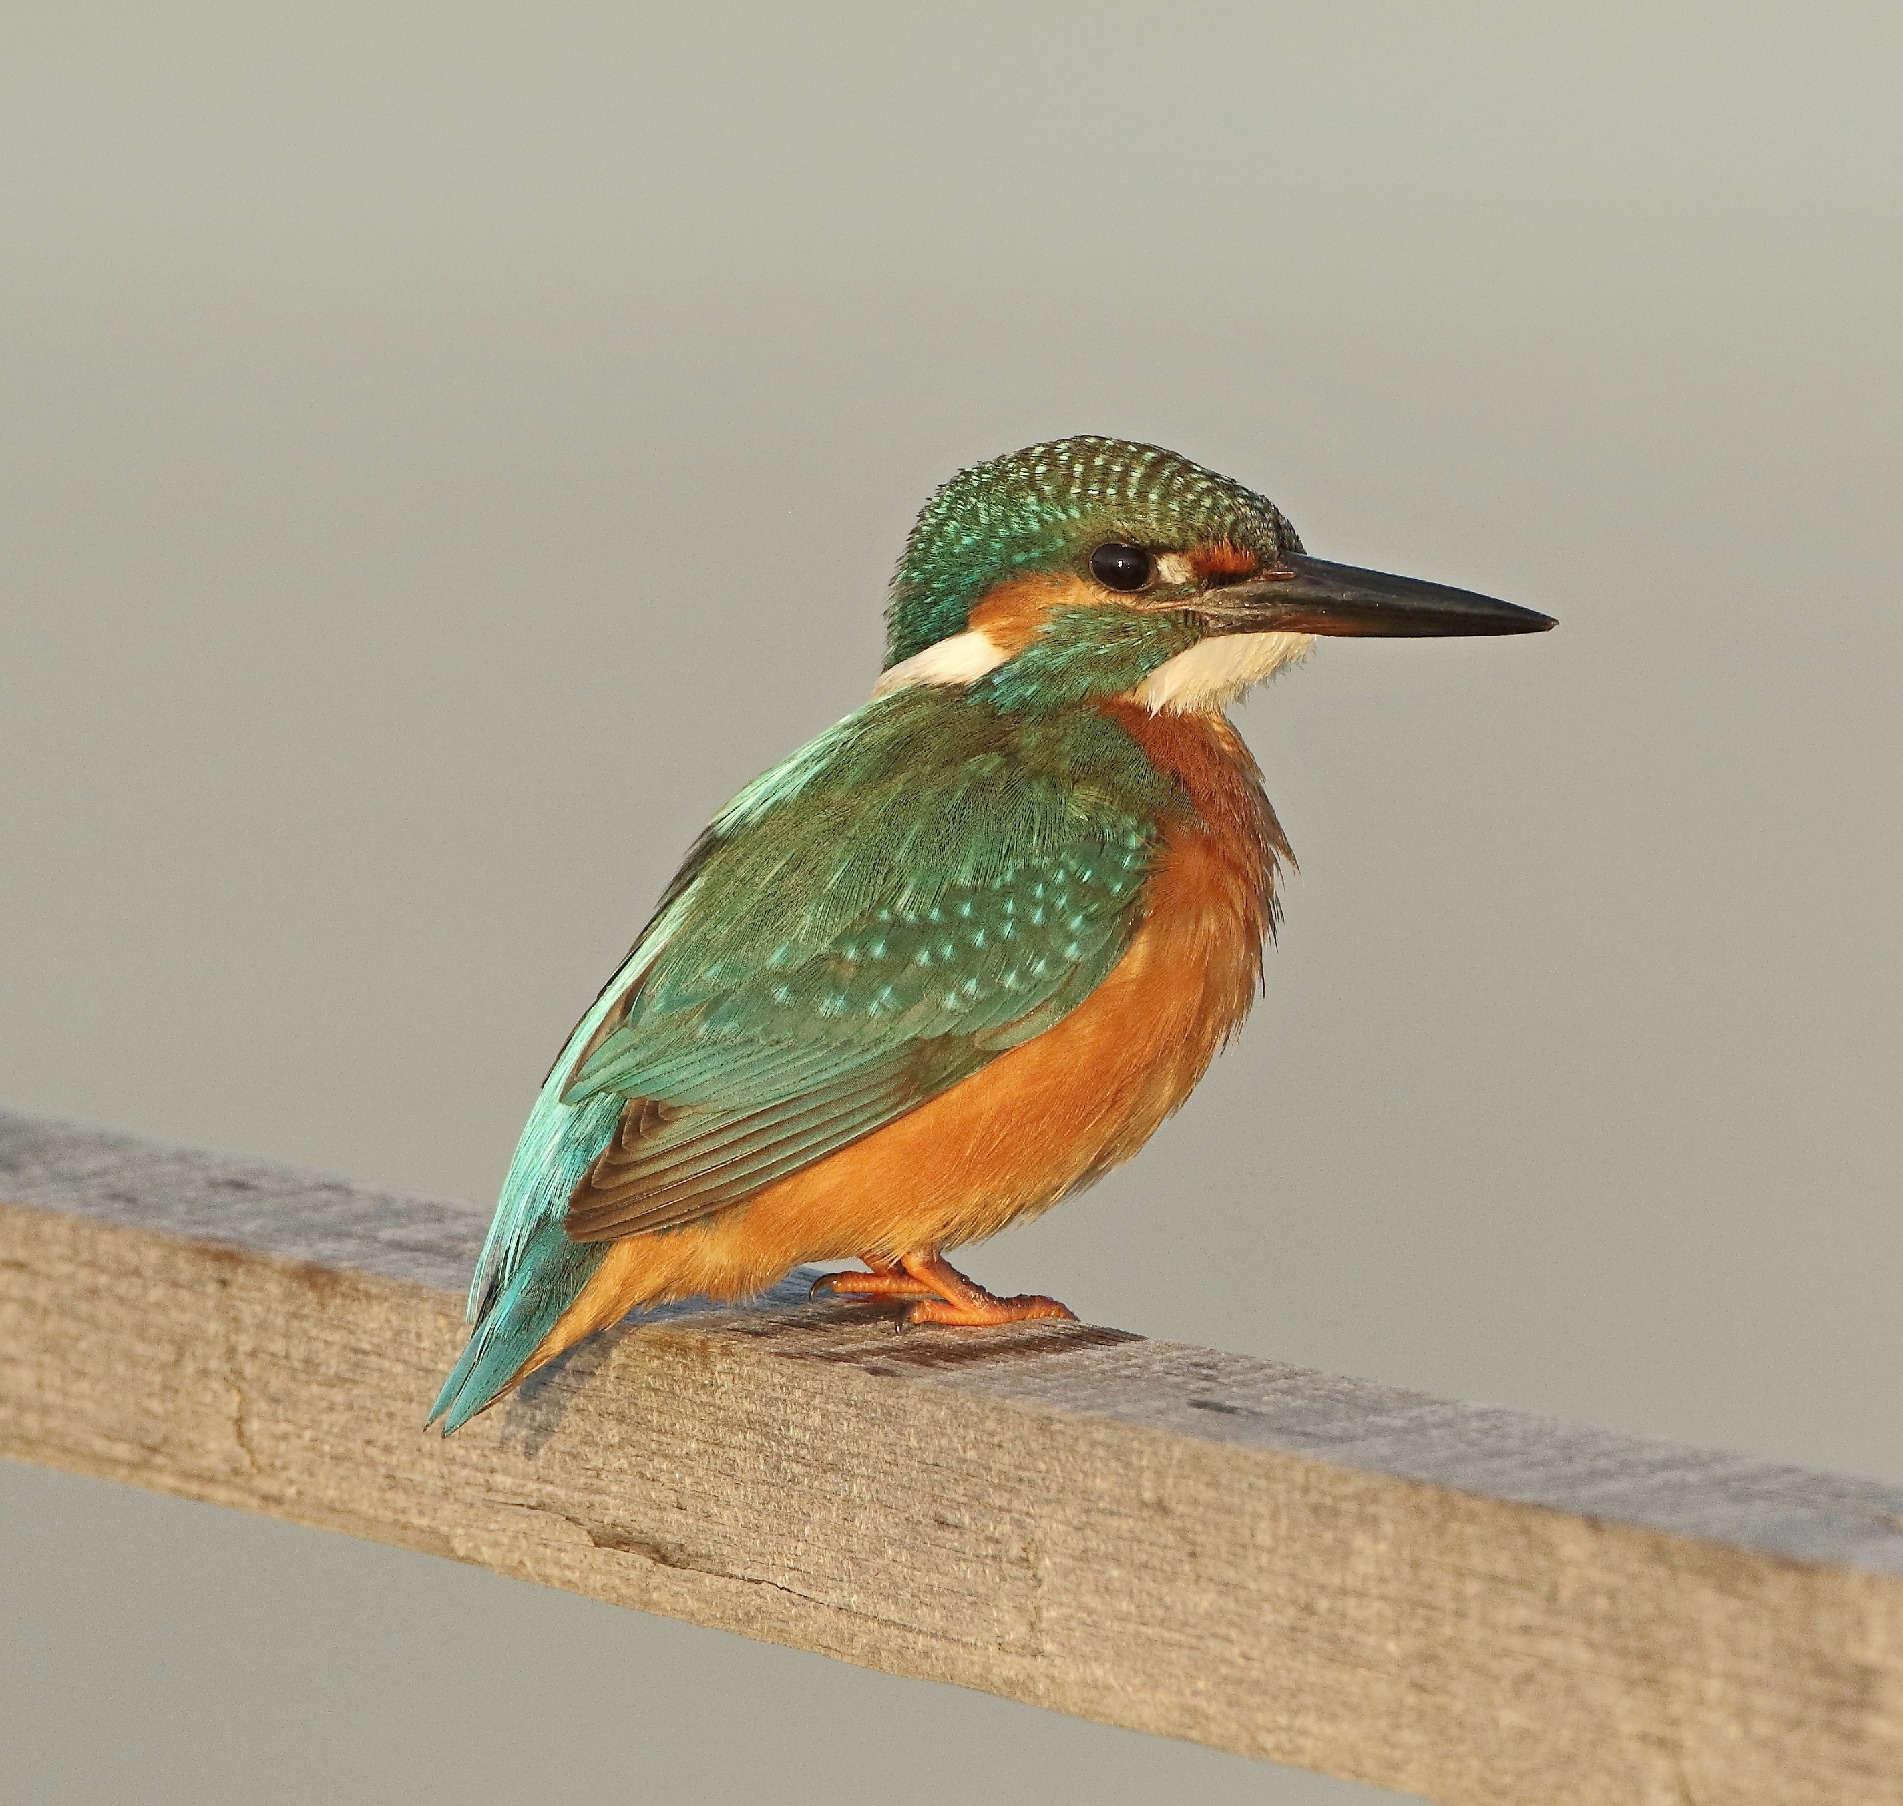 Kingfisher_Antonis_Tsaknakis_Portes_Magazine